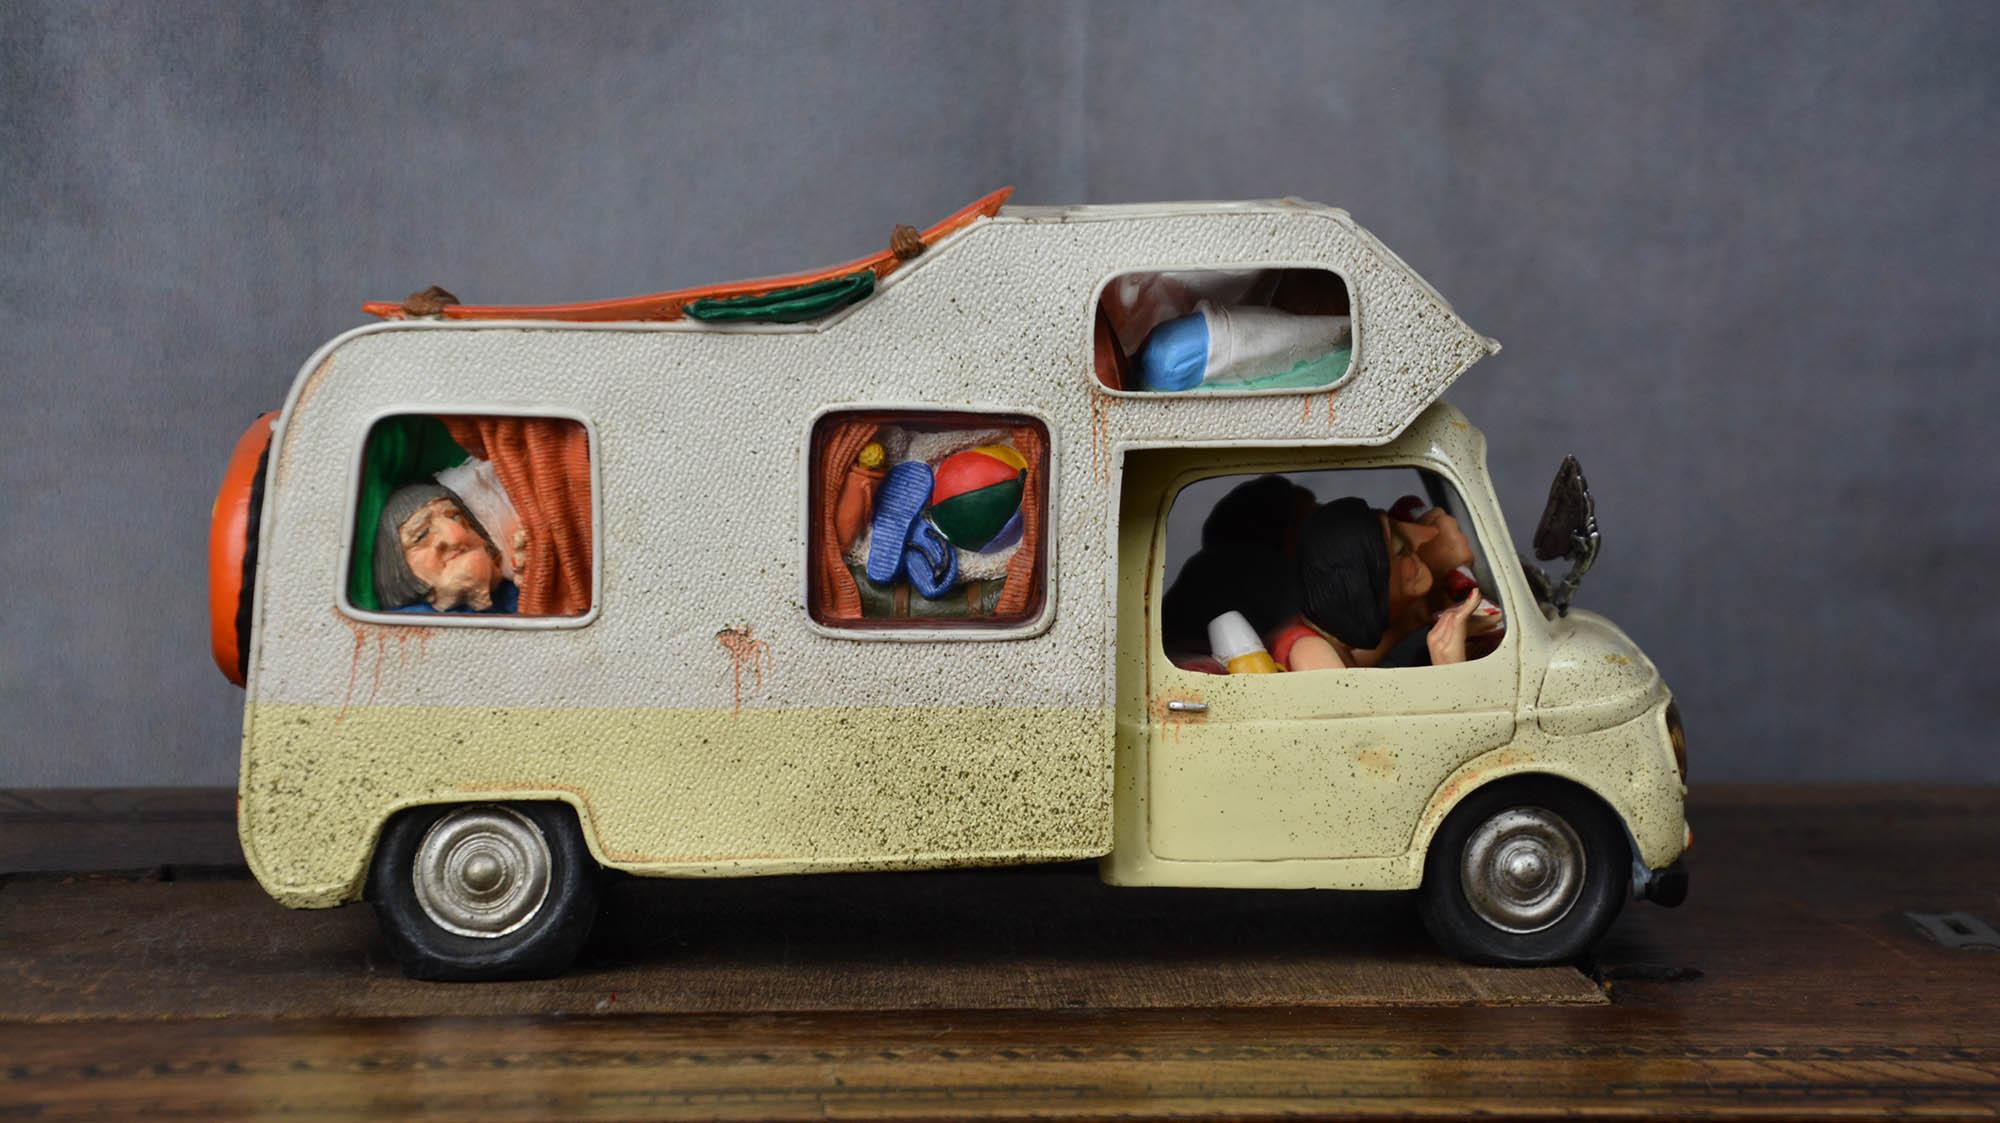 boutique figurine piece artisanale vehicule camping car parodie